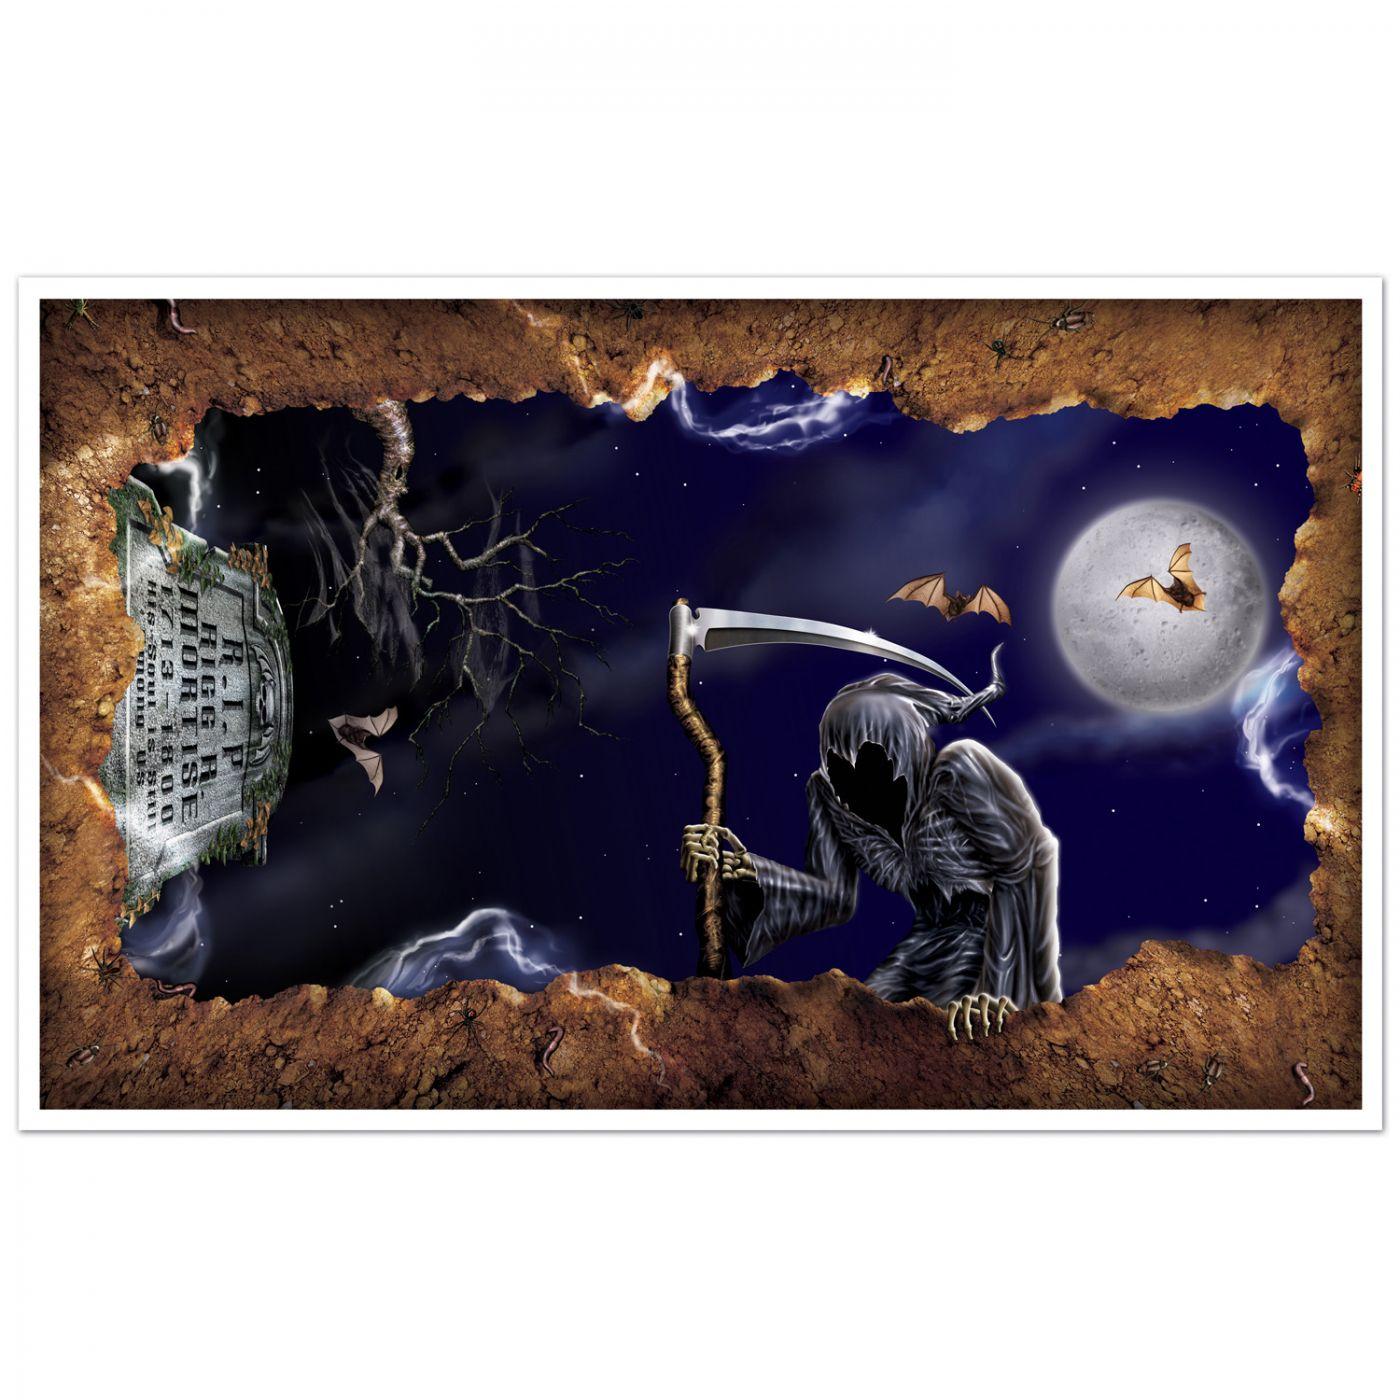 Open Grave Insta-View (6) image